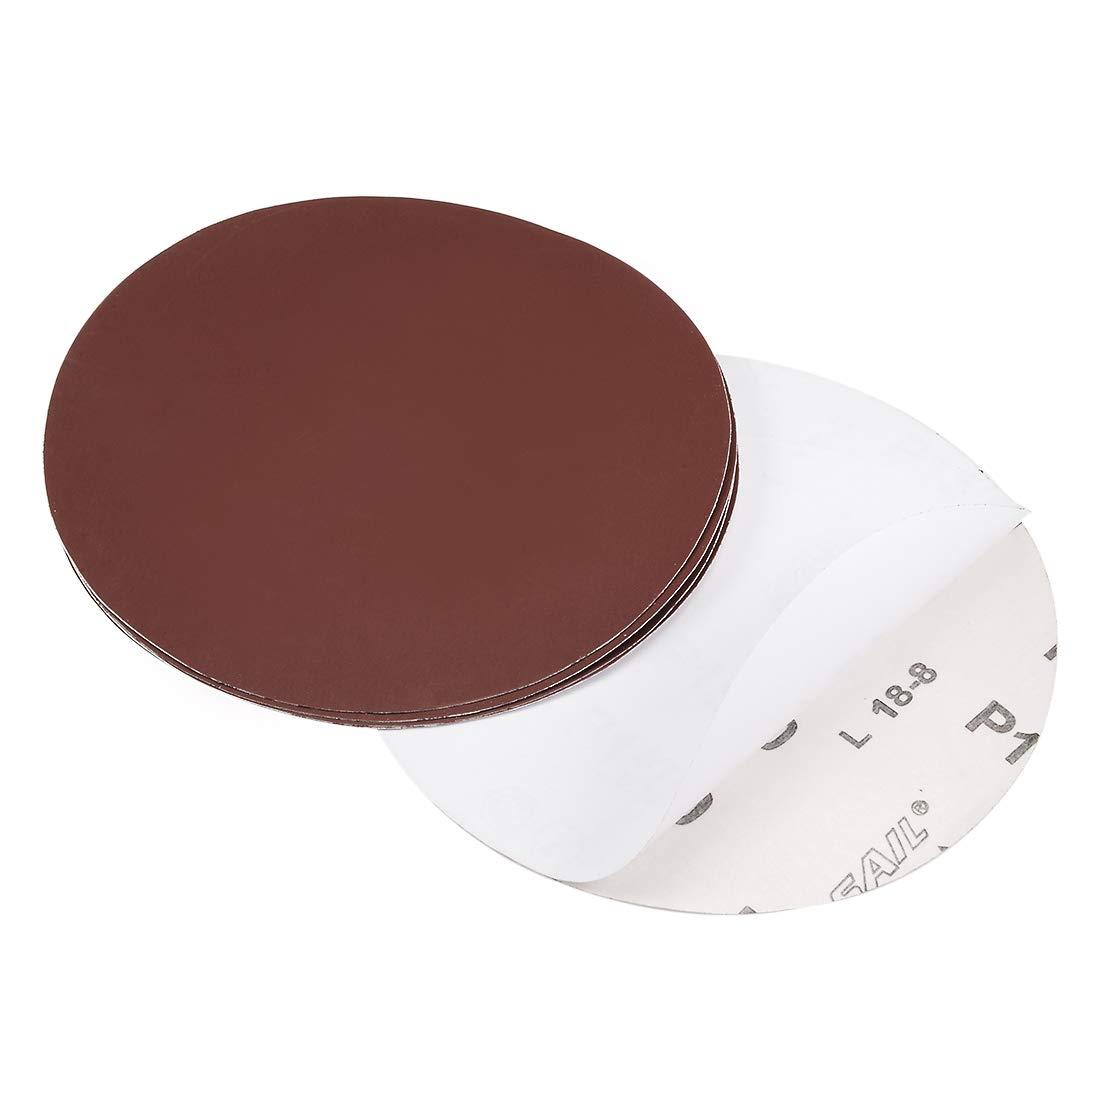 uxcell 6-inch PSA Sanding Discs 1500 Grits Self Stick Adhesive Back Aluminum Oxide Sandpaper 5pcs